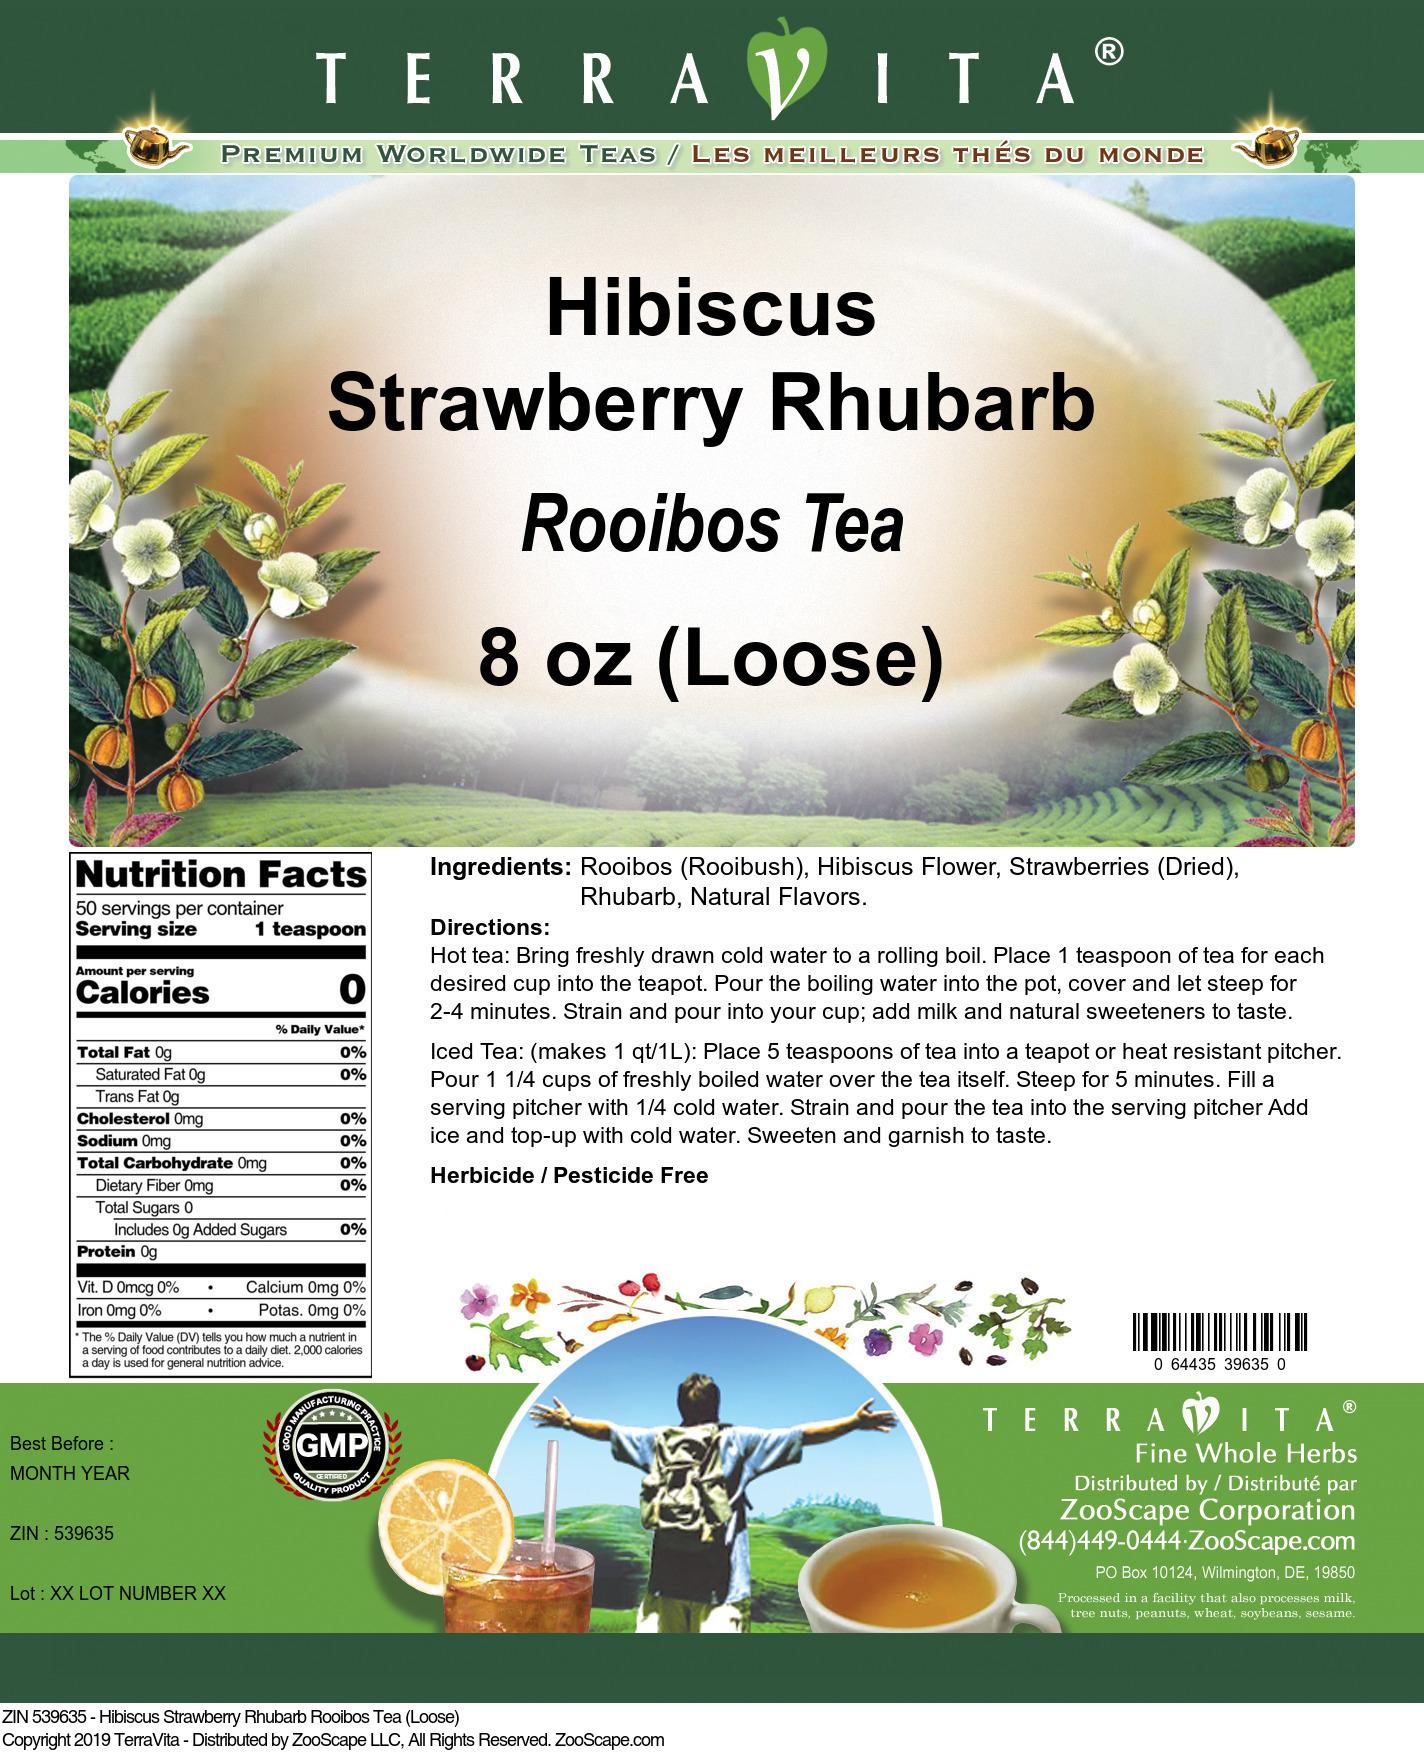 Hibiscus Strawberry Rhubarb Rooibos Tea (Loose)